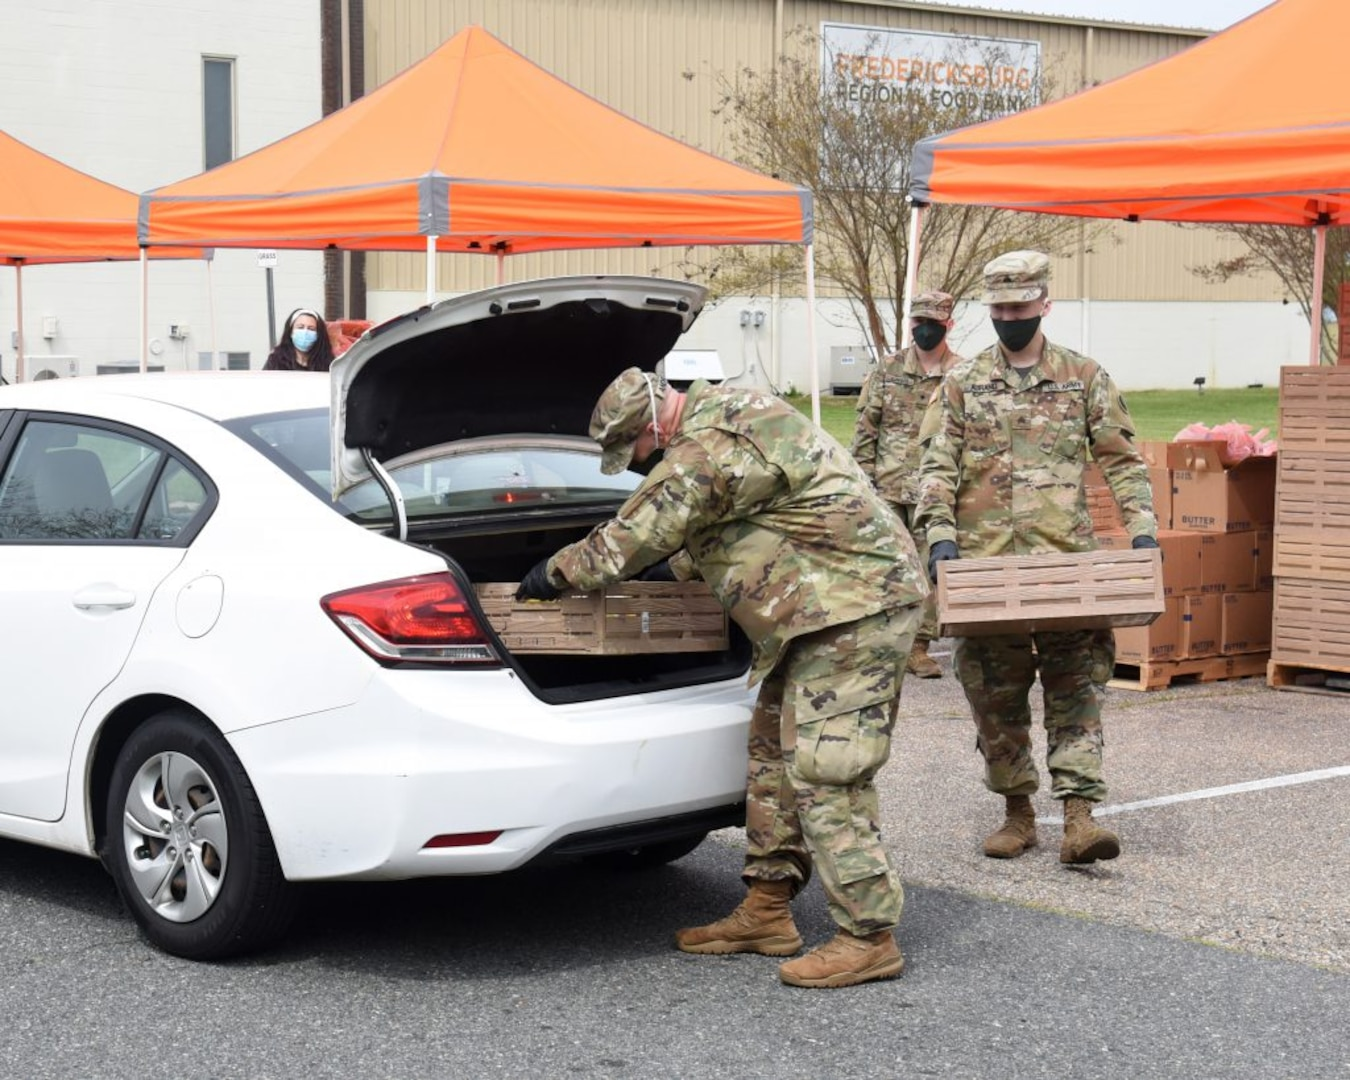 229th BEB supports operations at Fredericksburg Regional Food Bank